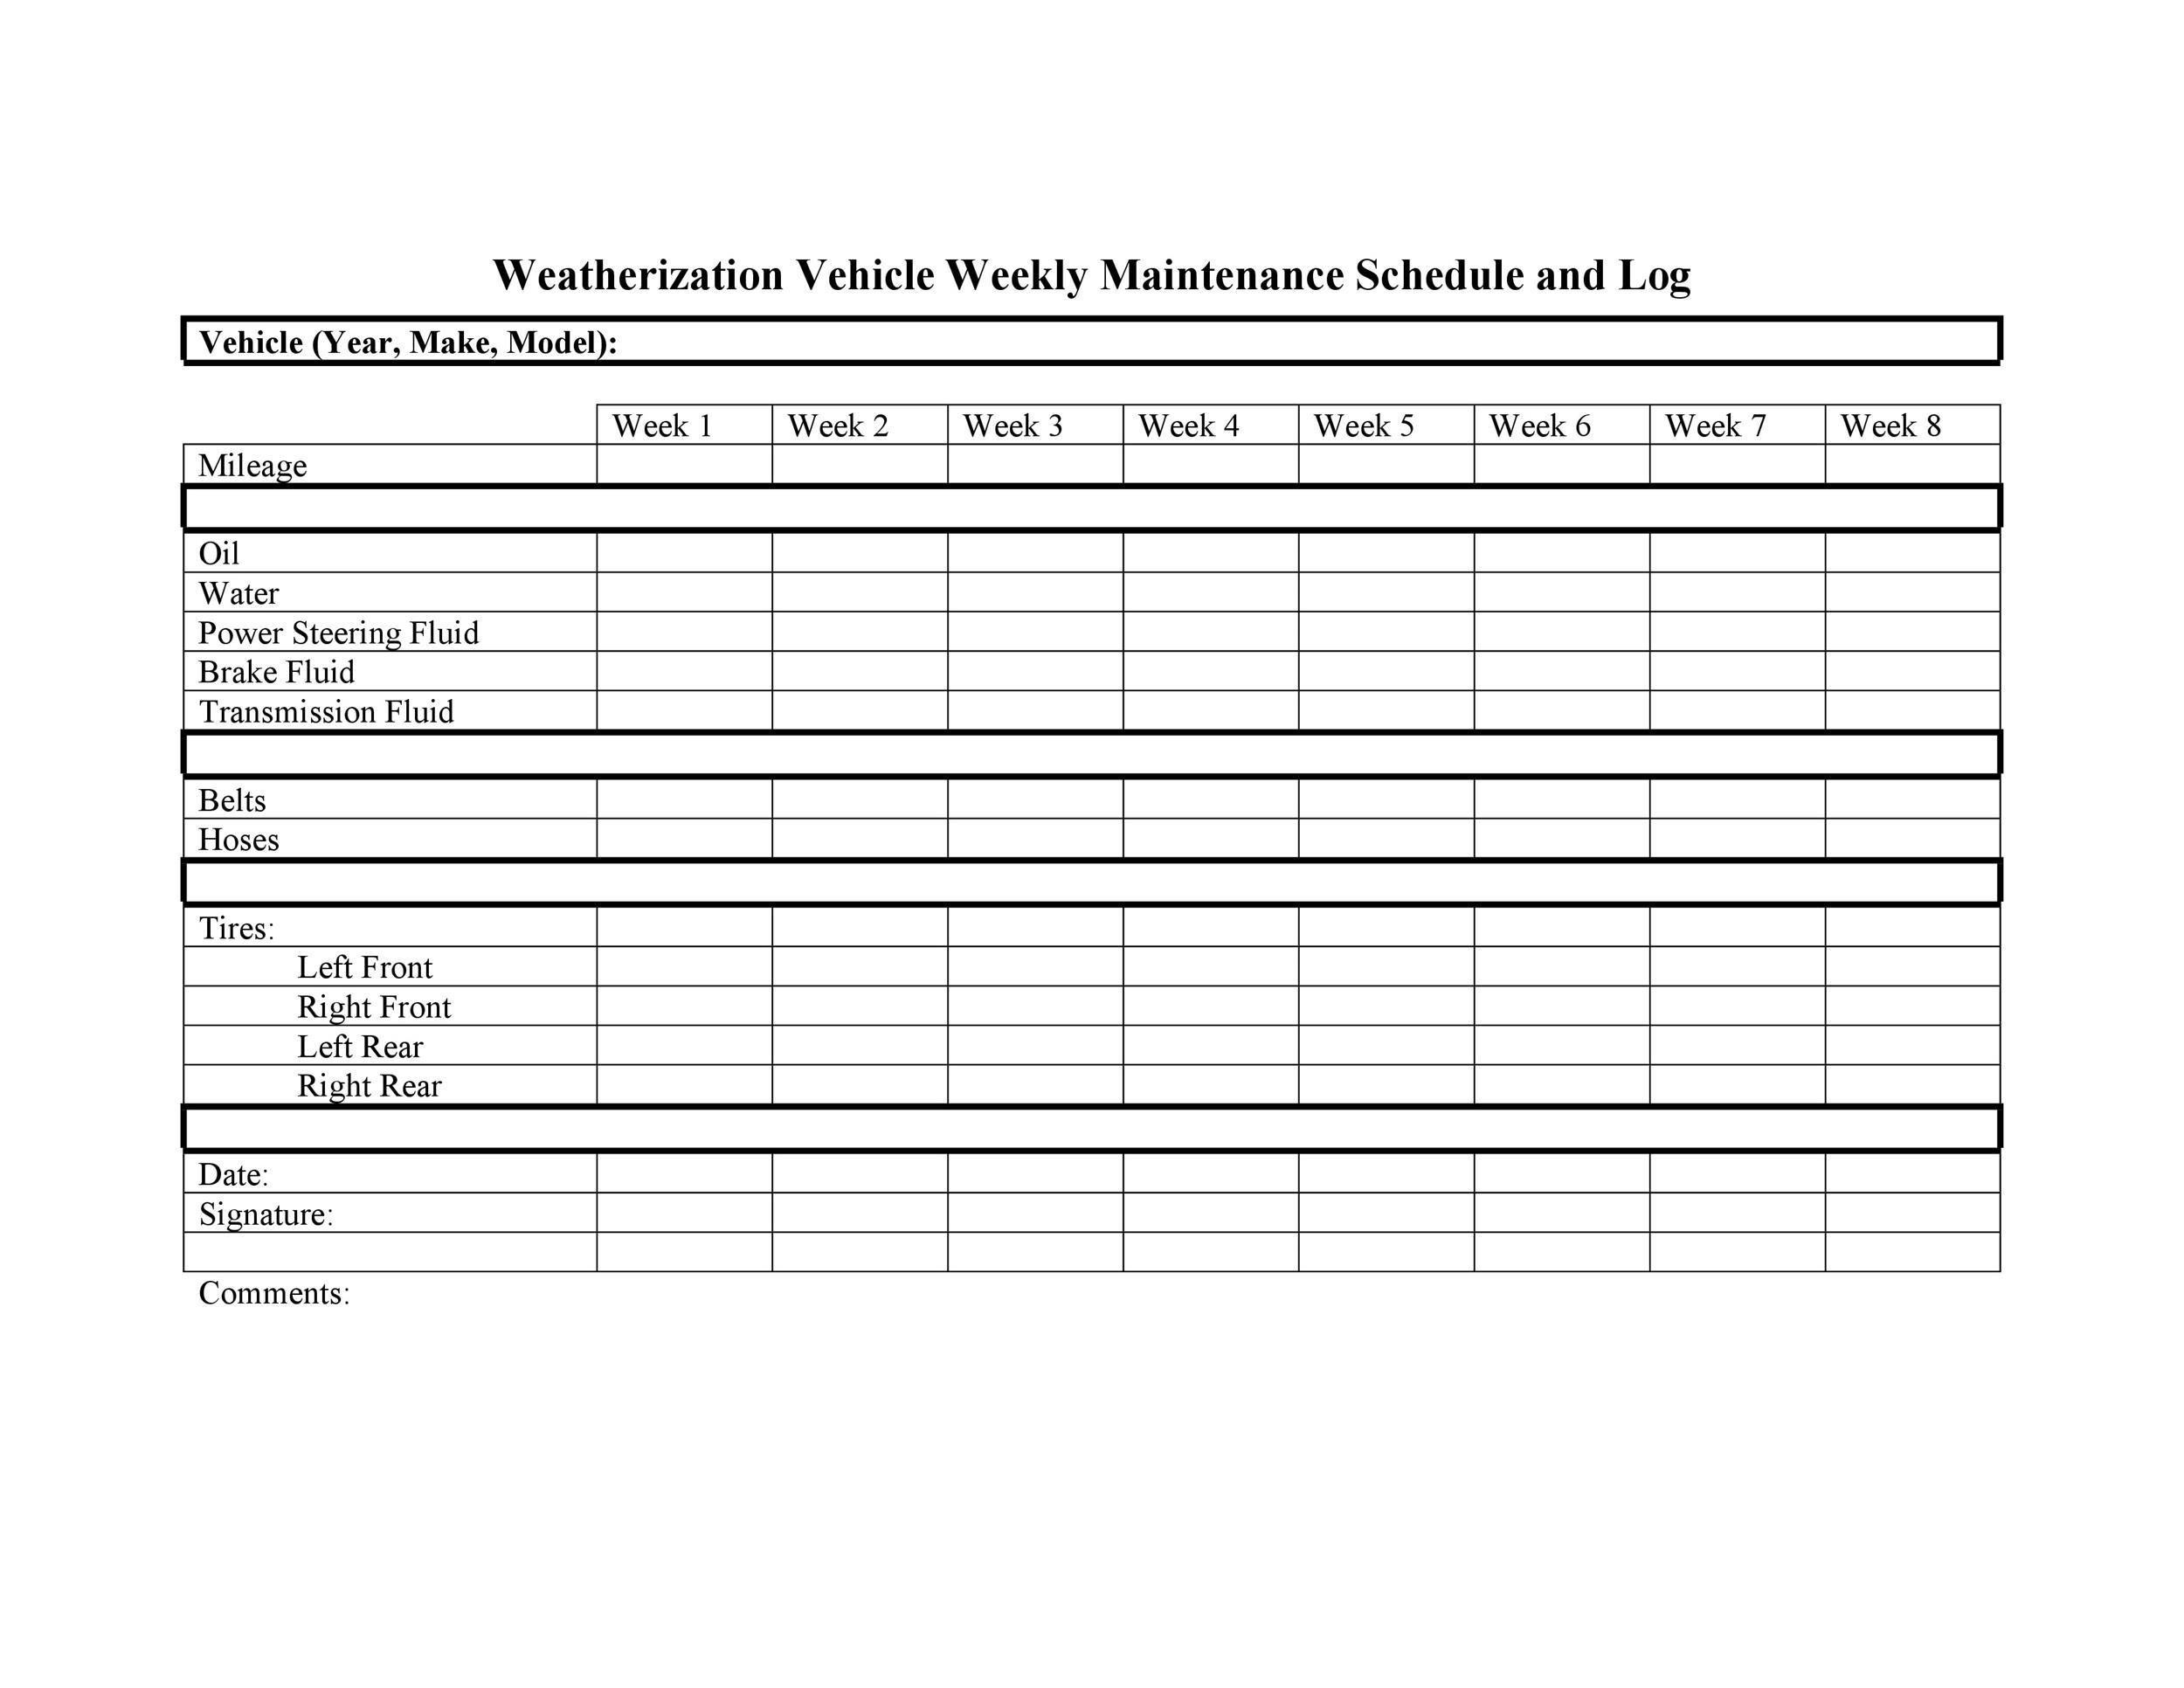 43 Printable Vehicle Maintenance Log Templates Á… Templatelab